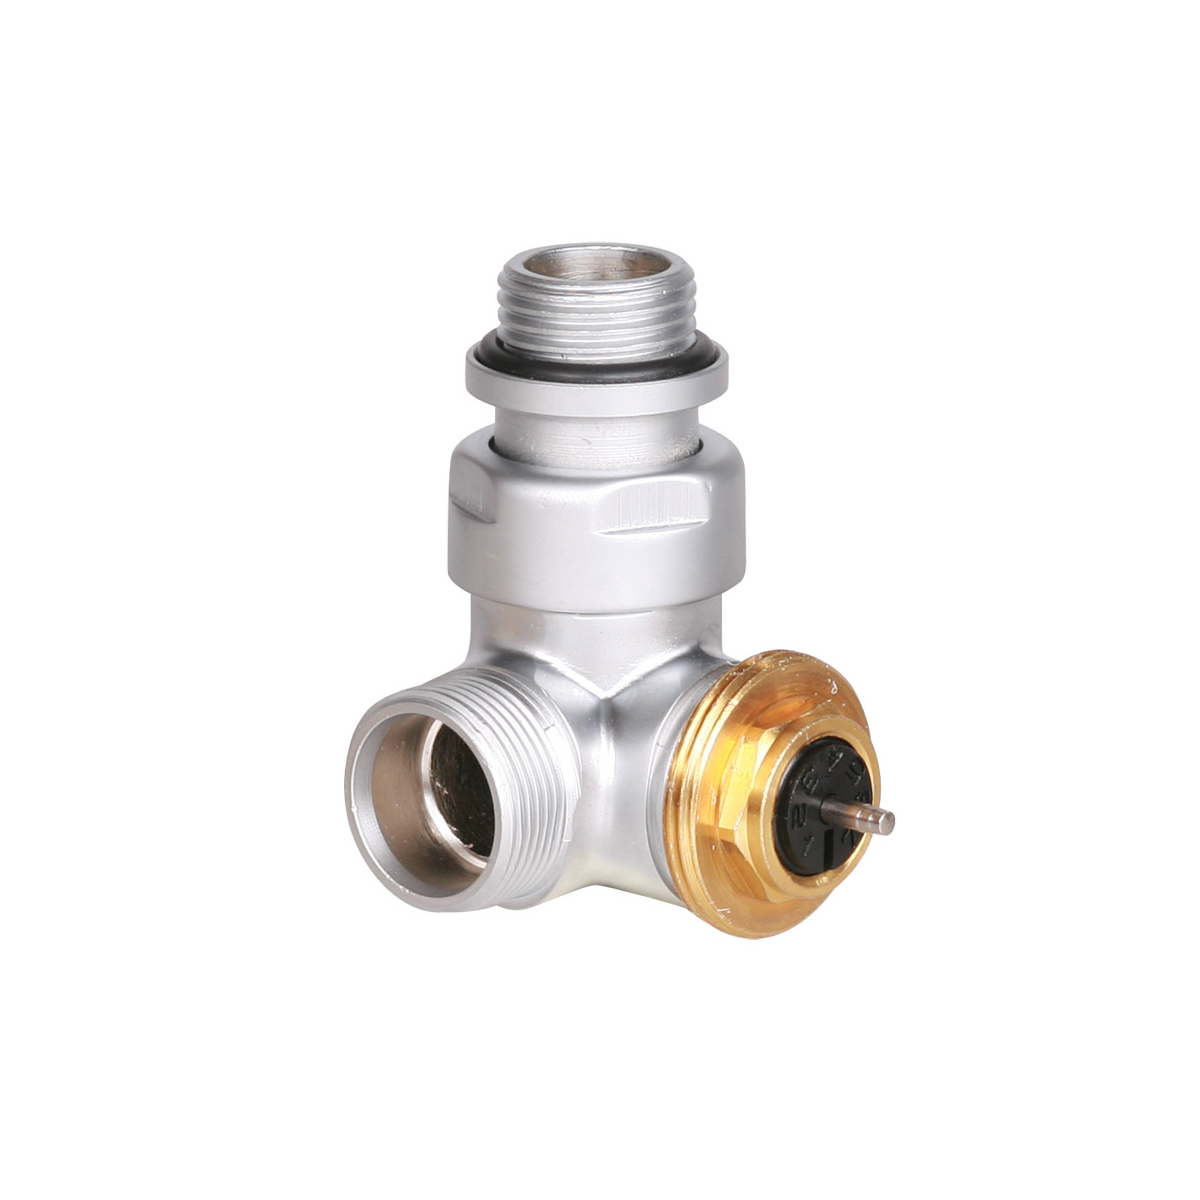 3- Achsen Thermostatventil, Thermostat links